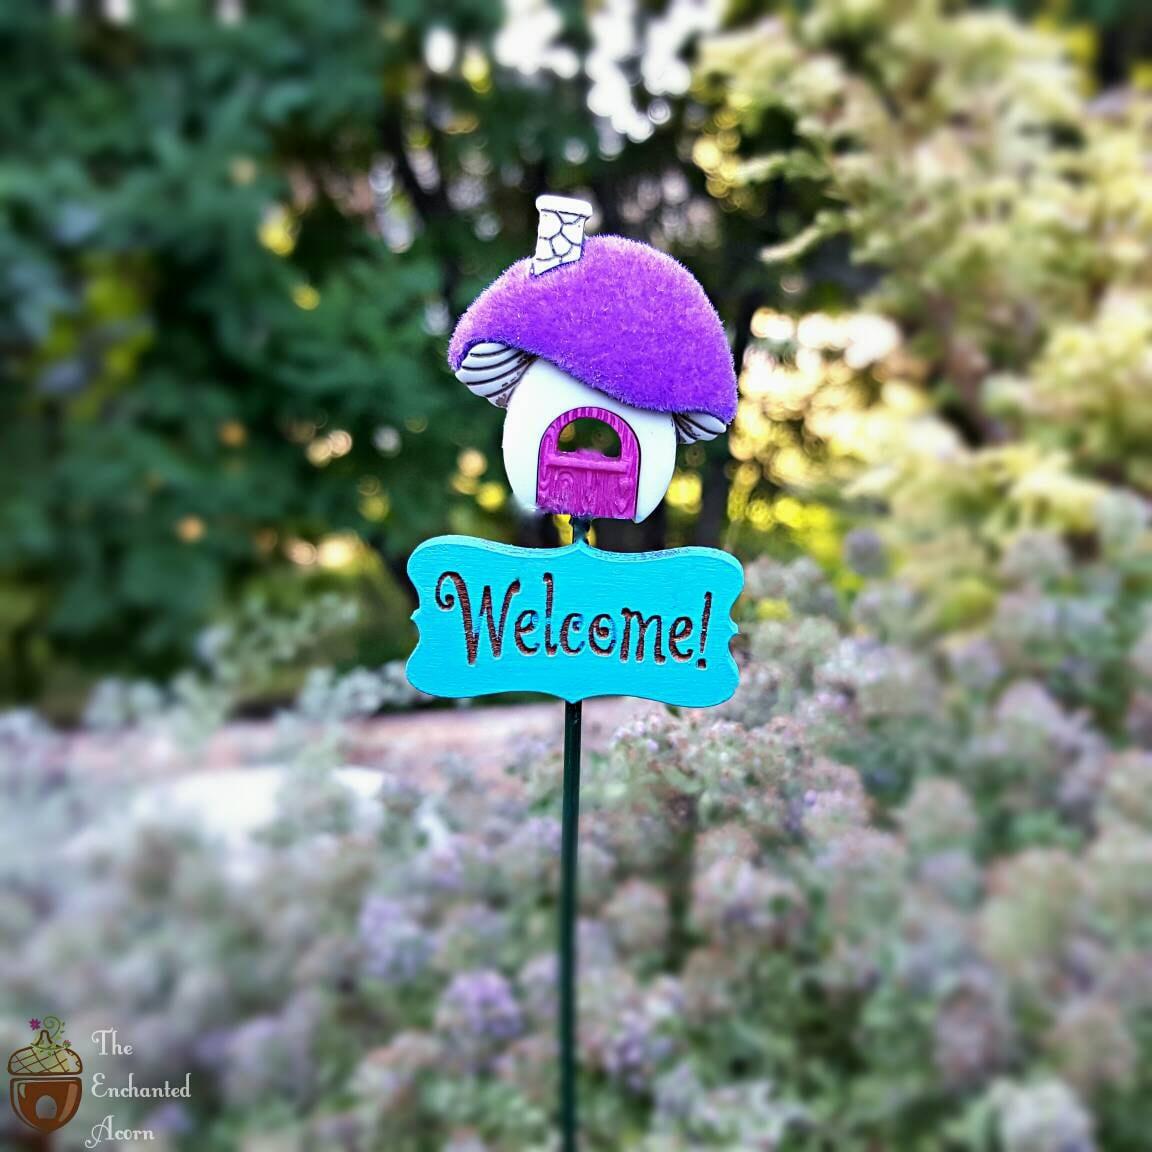 Gnome Garden: Fairy Garden Welcome Sign Miniature Mushroom House Fairy